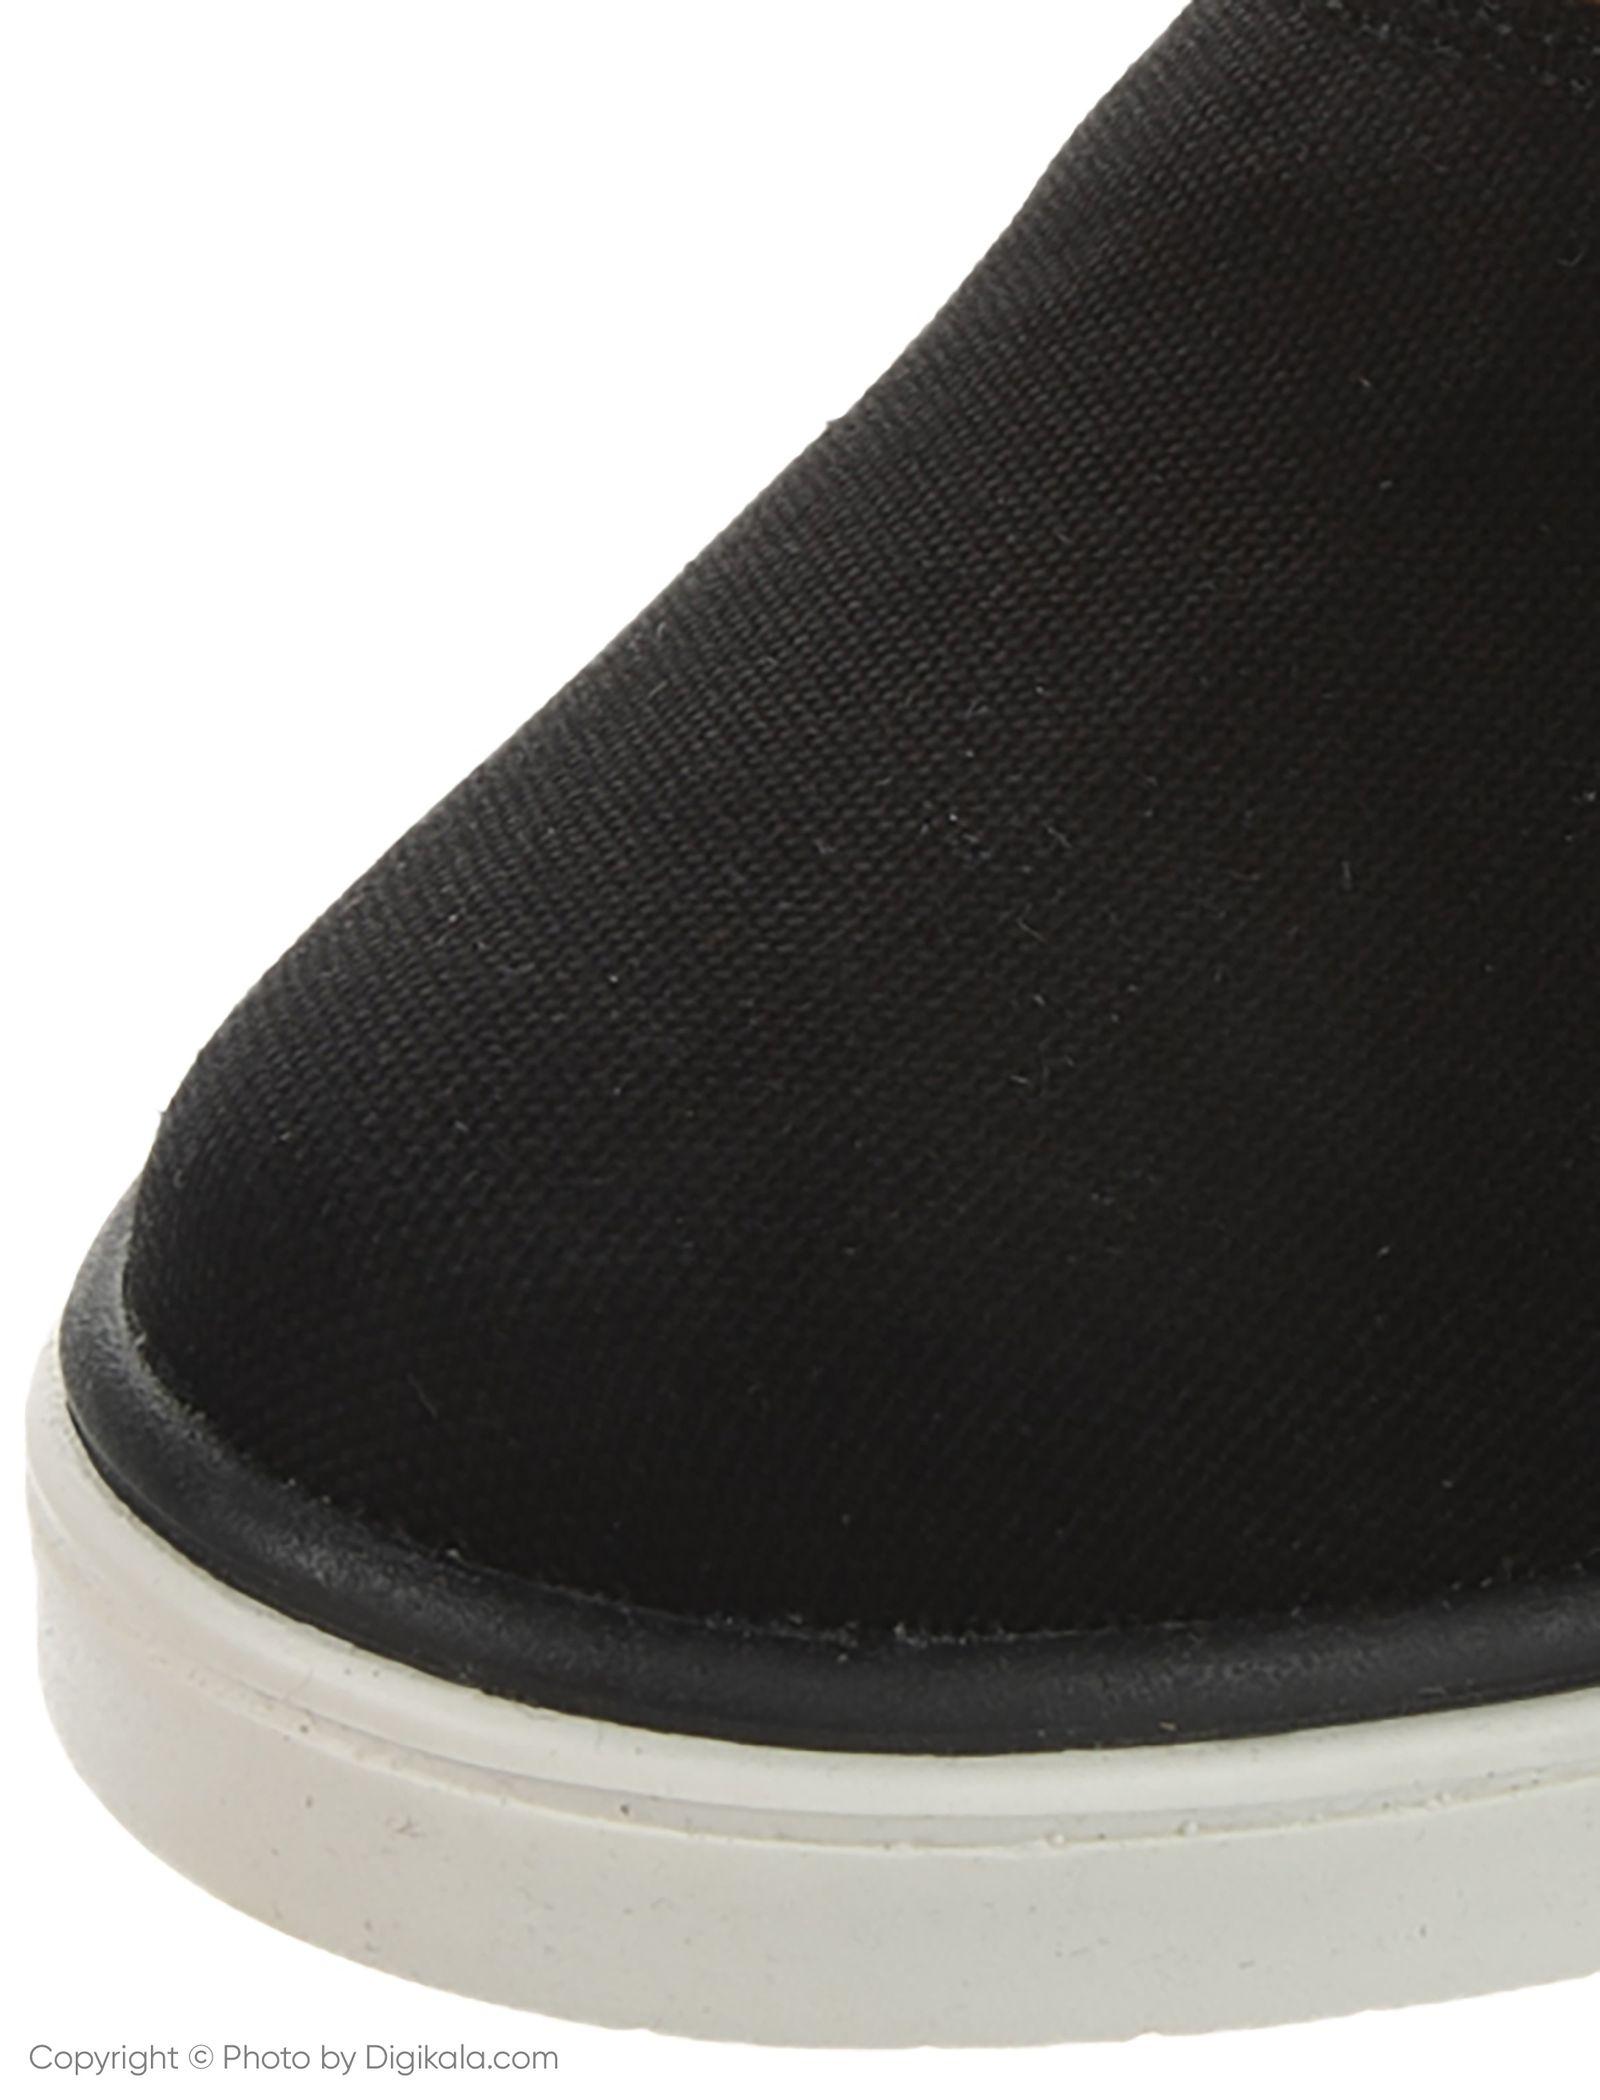 کفش روزمره مردانه داکرز مدل 100234016-BL -  - 6